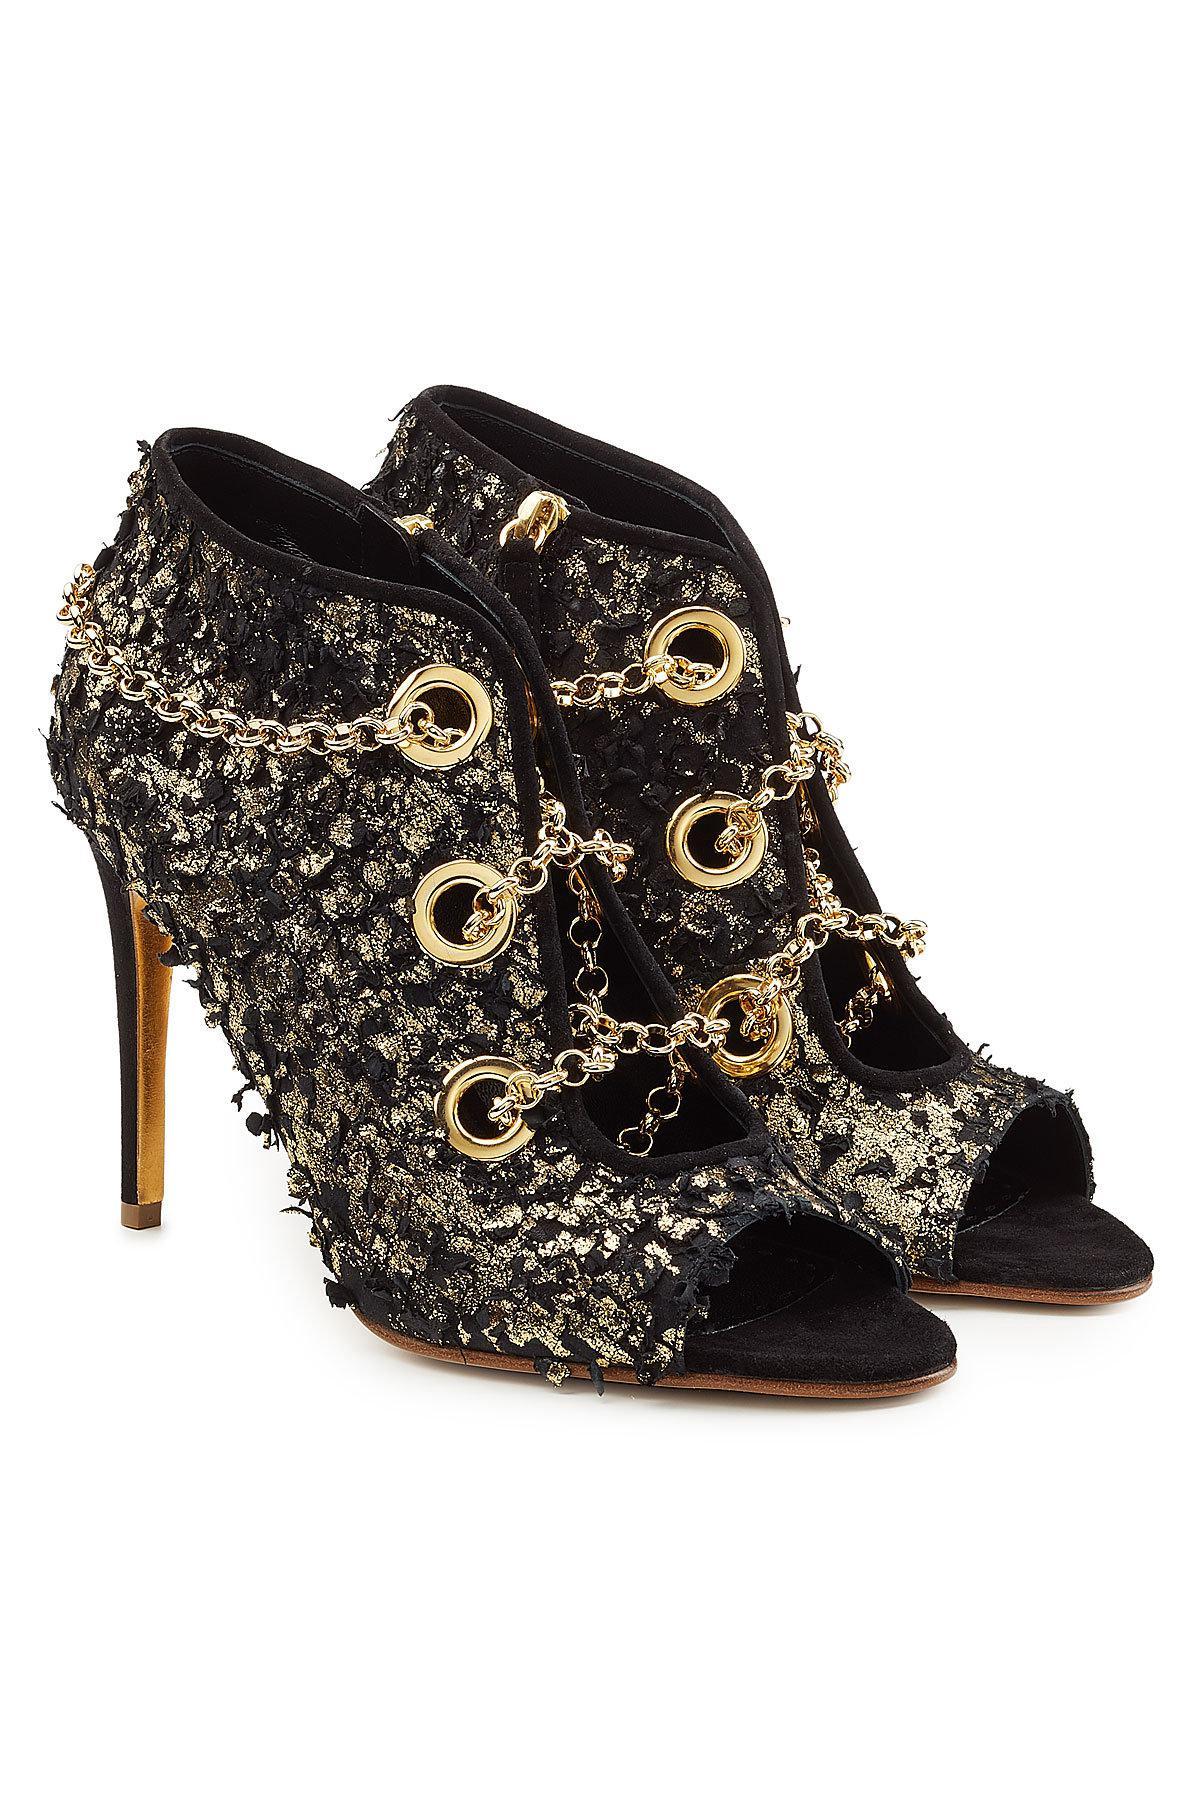 Clearance Newest Nicekicks Sale Online Rupert Sanderson Women's Nightingale Venus Suede Heeled Shoe Boots Free Shipping Geniue Stockist pXvg6dRZEL